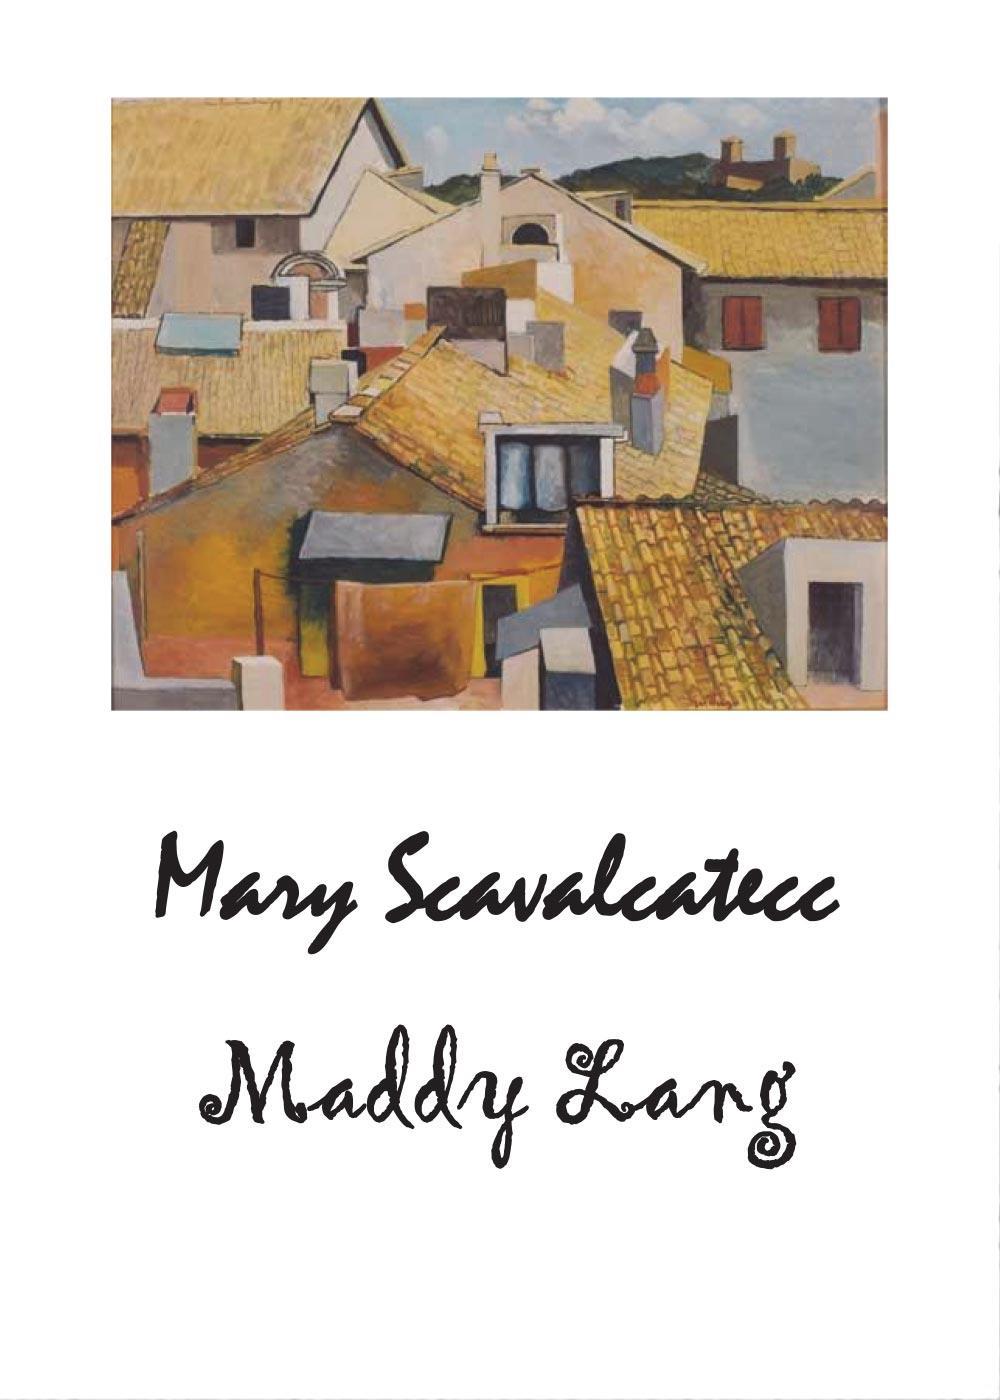 Mary Scavalcatecc